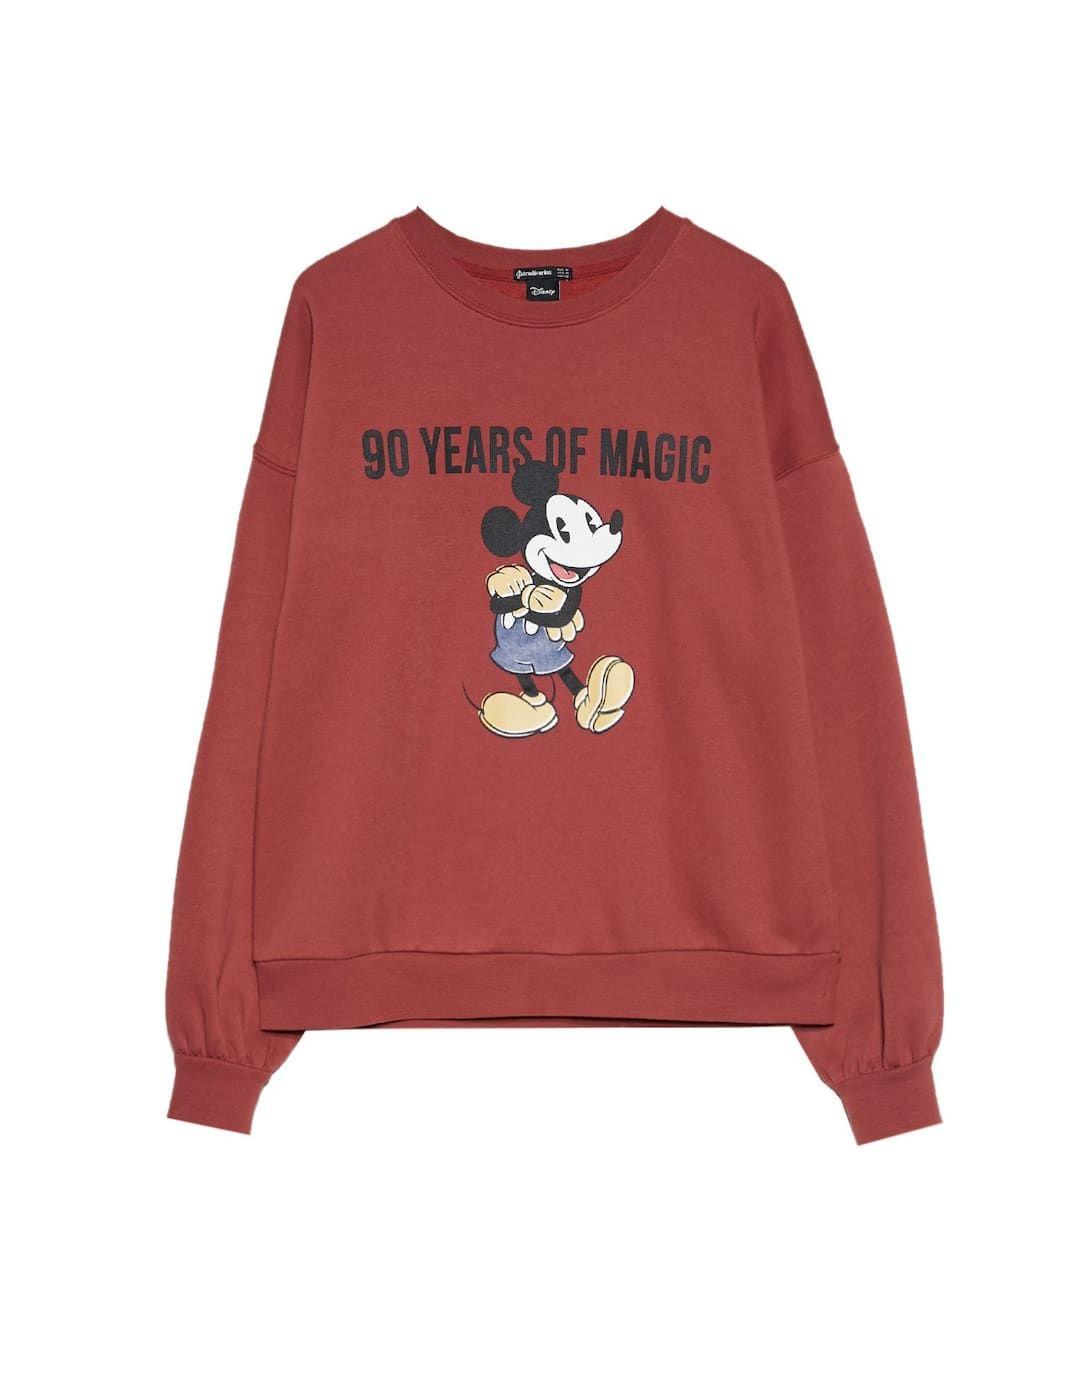 691c2e472b2cb Sudadera Mickey Mouse - Sudaderas de mujer